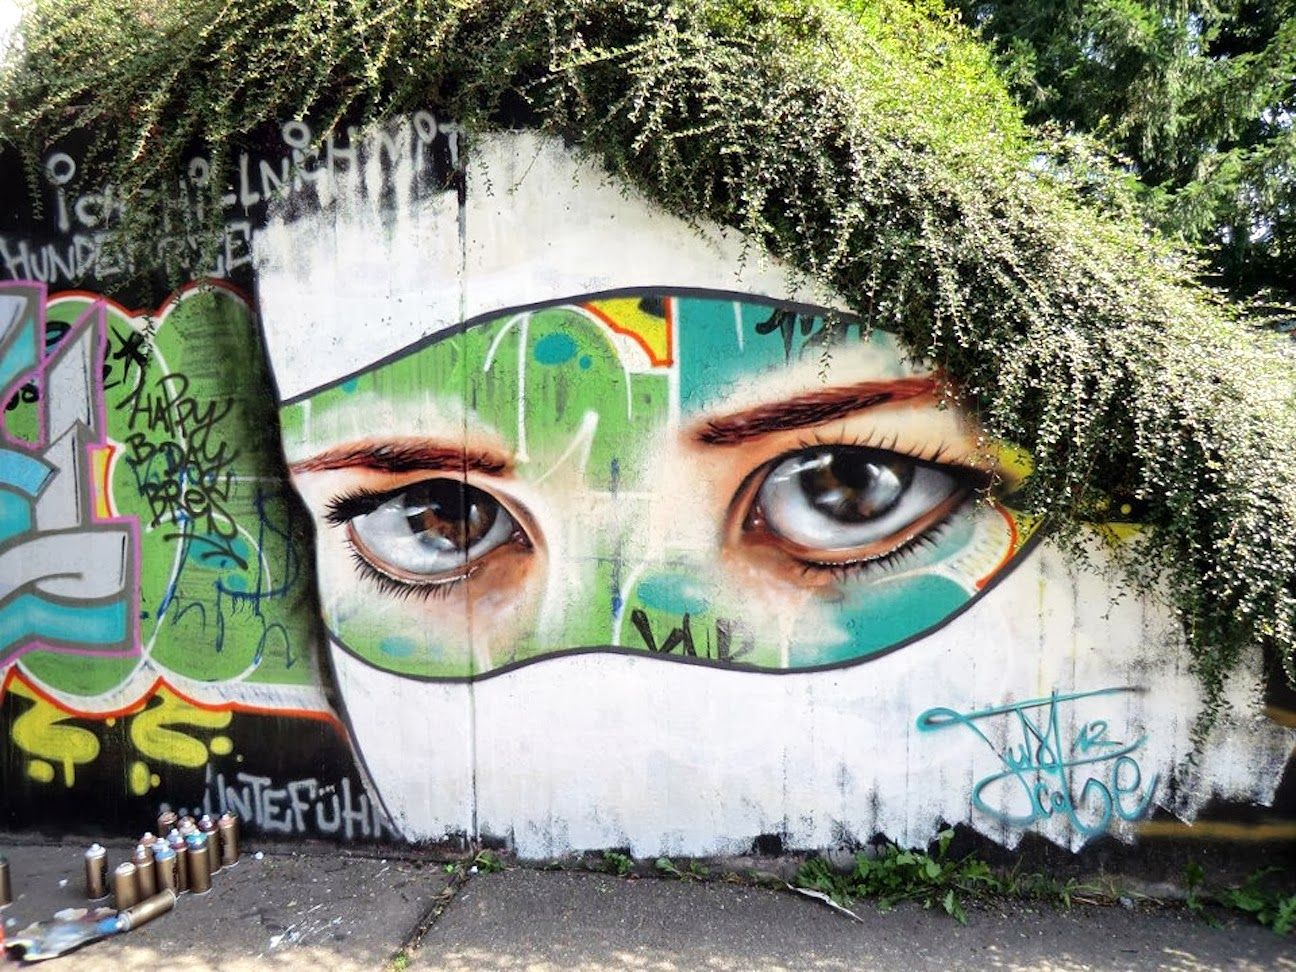 Arte + Naturaleza: 40 ejemplos de arte urbano natural